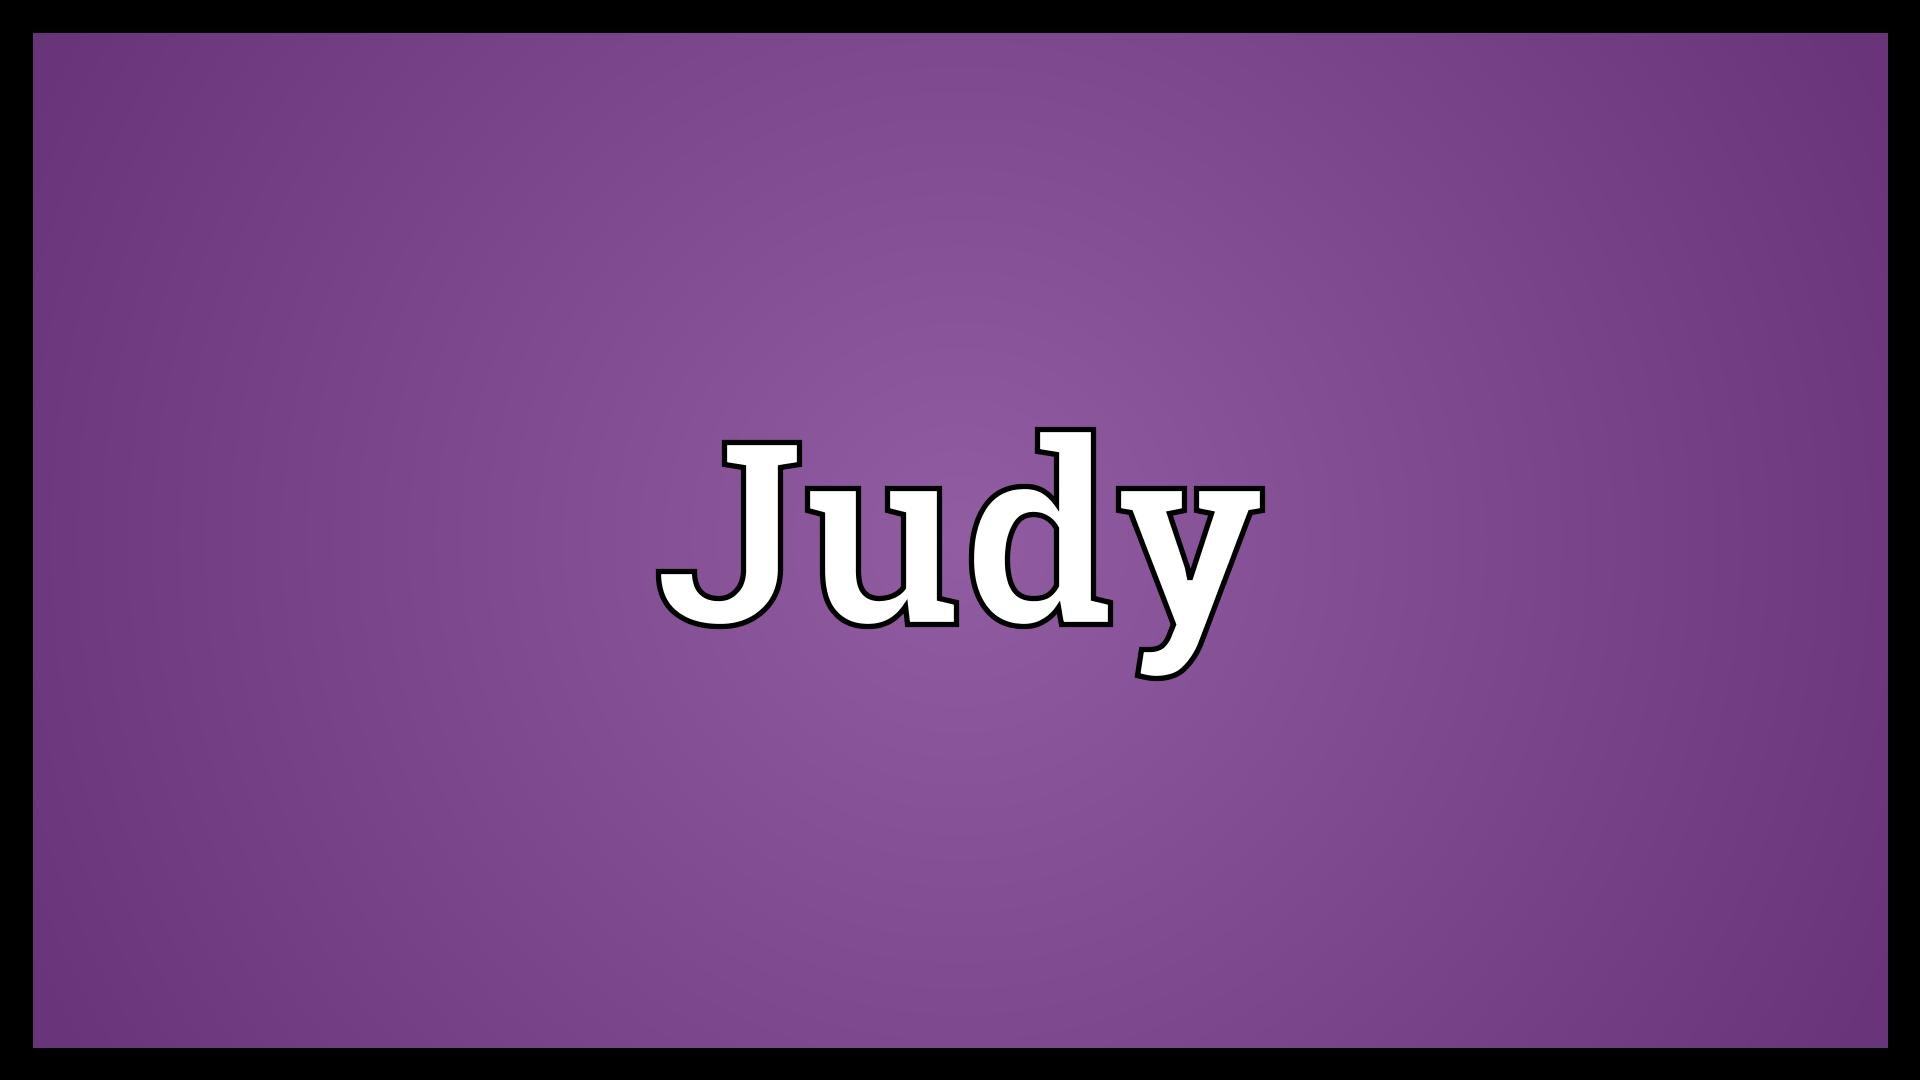 صوره معنى اسم جودي , صفات من يحملن اسم جودى